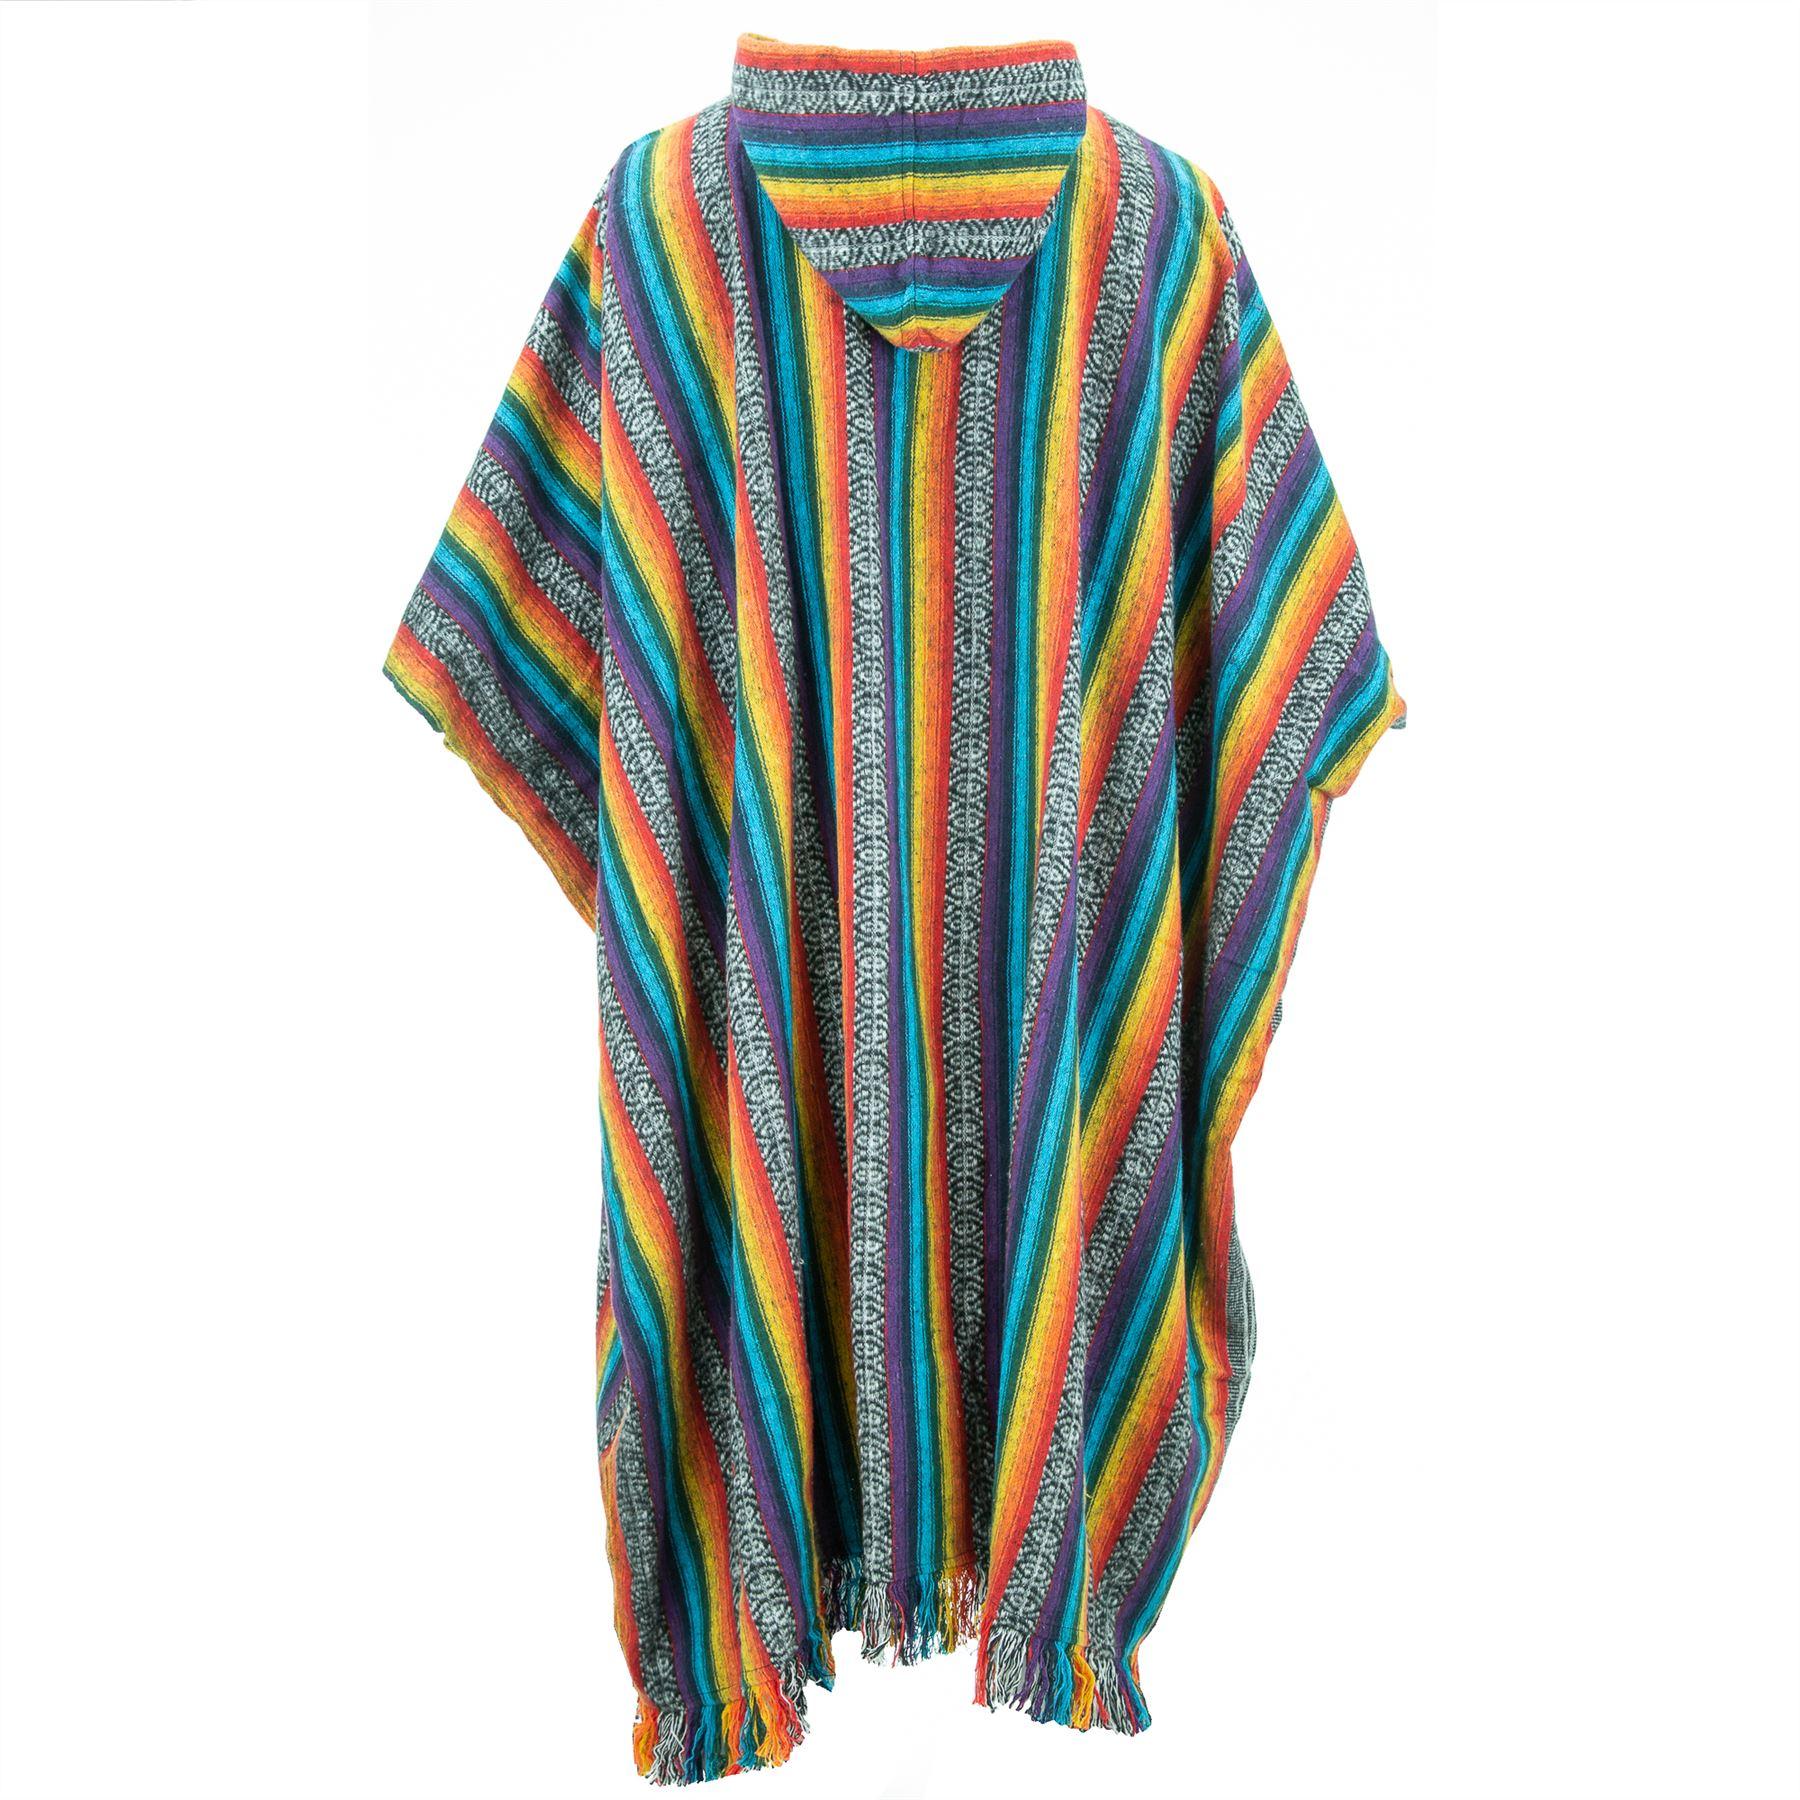 Poncho-Hooded-Cape-Cotton-Warm-Festival-Long-Woven-Rainbow-Men-Women thumbnail 15